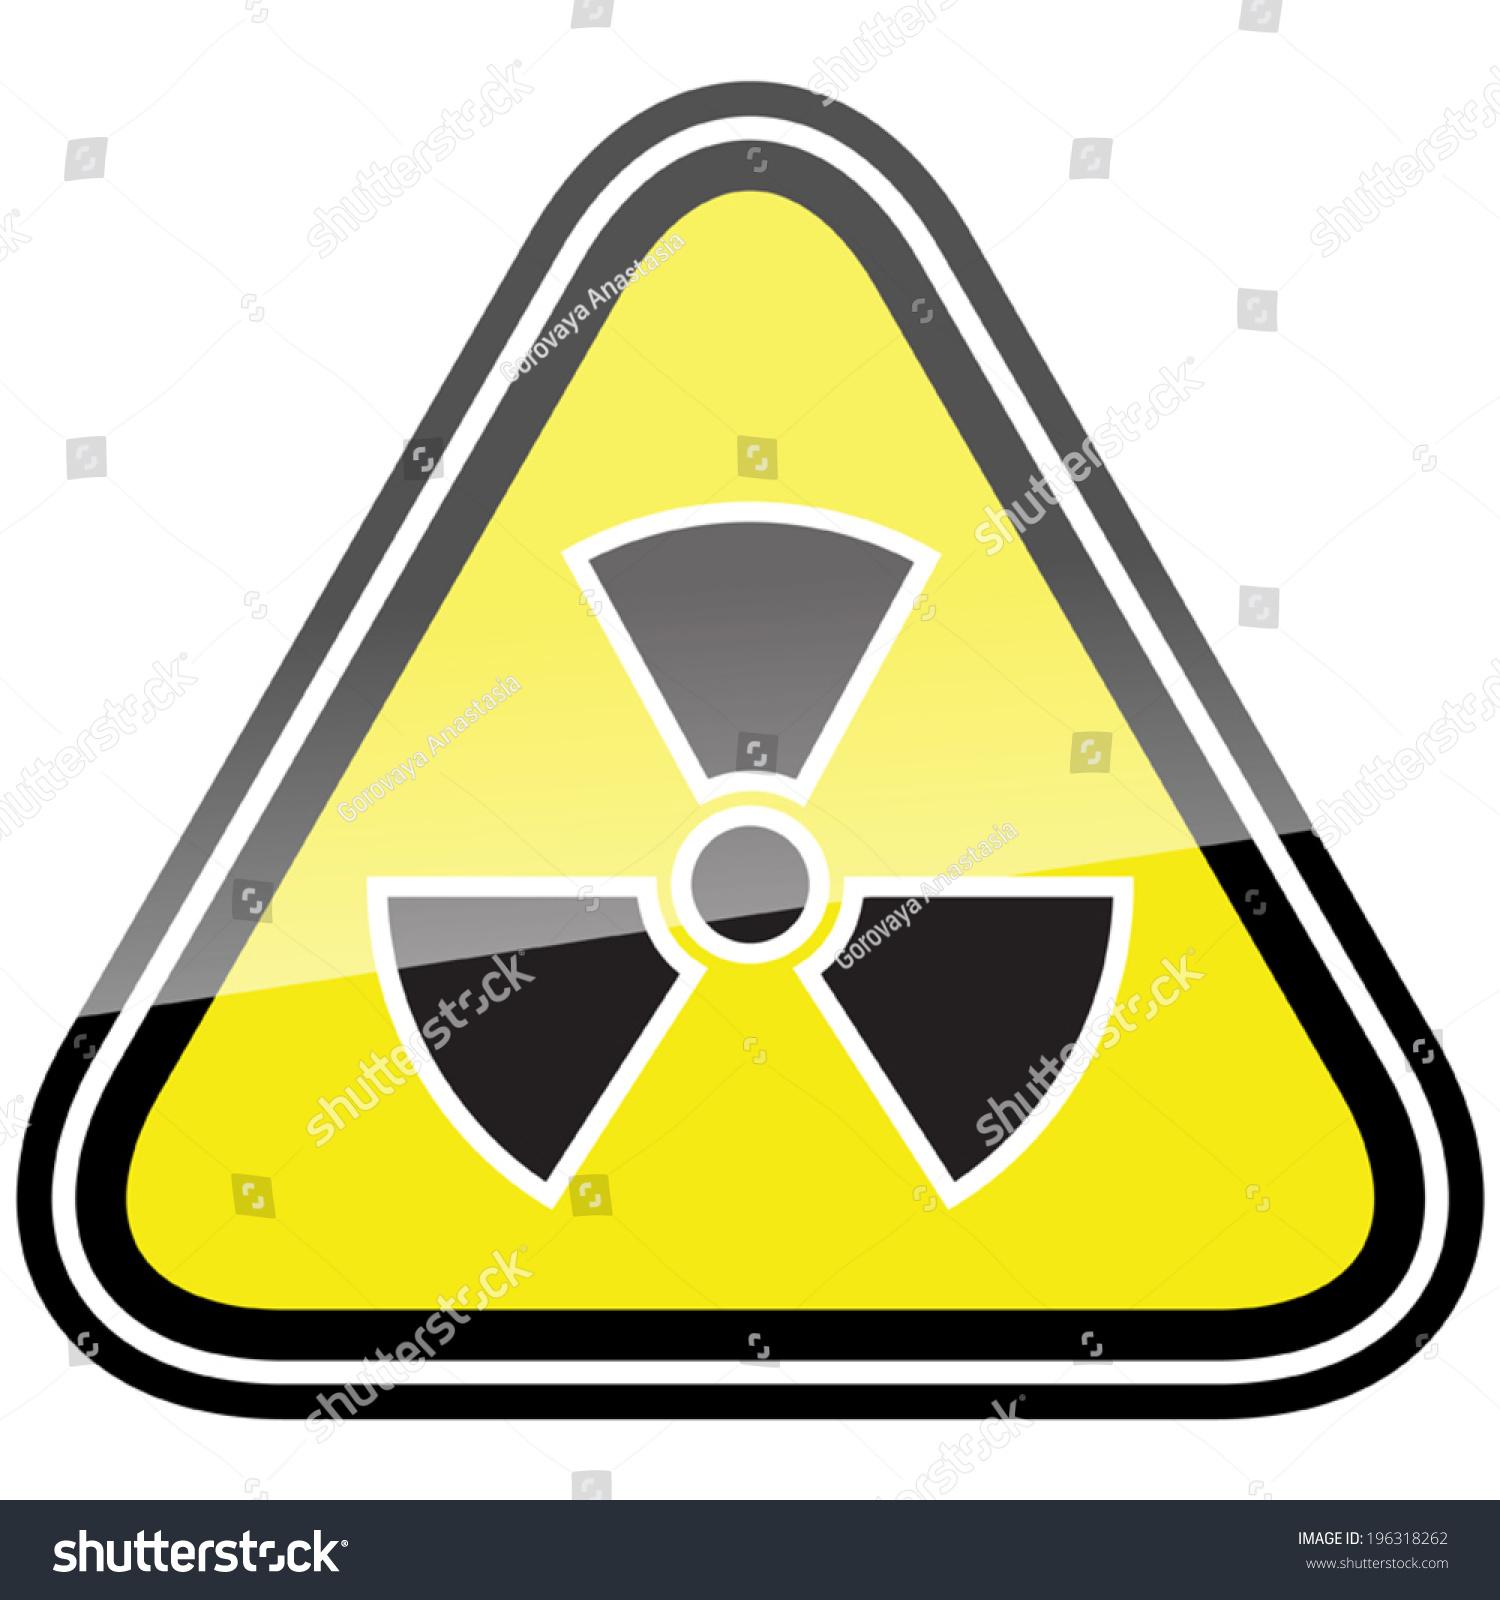 Science lab hazard symbols images symbol and sign ideas radiation hazard symbol sign radiation alert stock vector radiation hazard symbol sign of radiation alert icon biocorpaavc Gallery